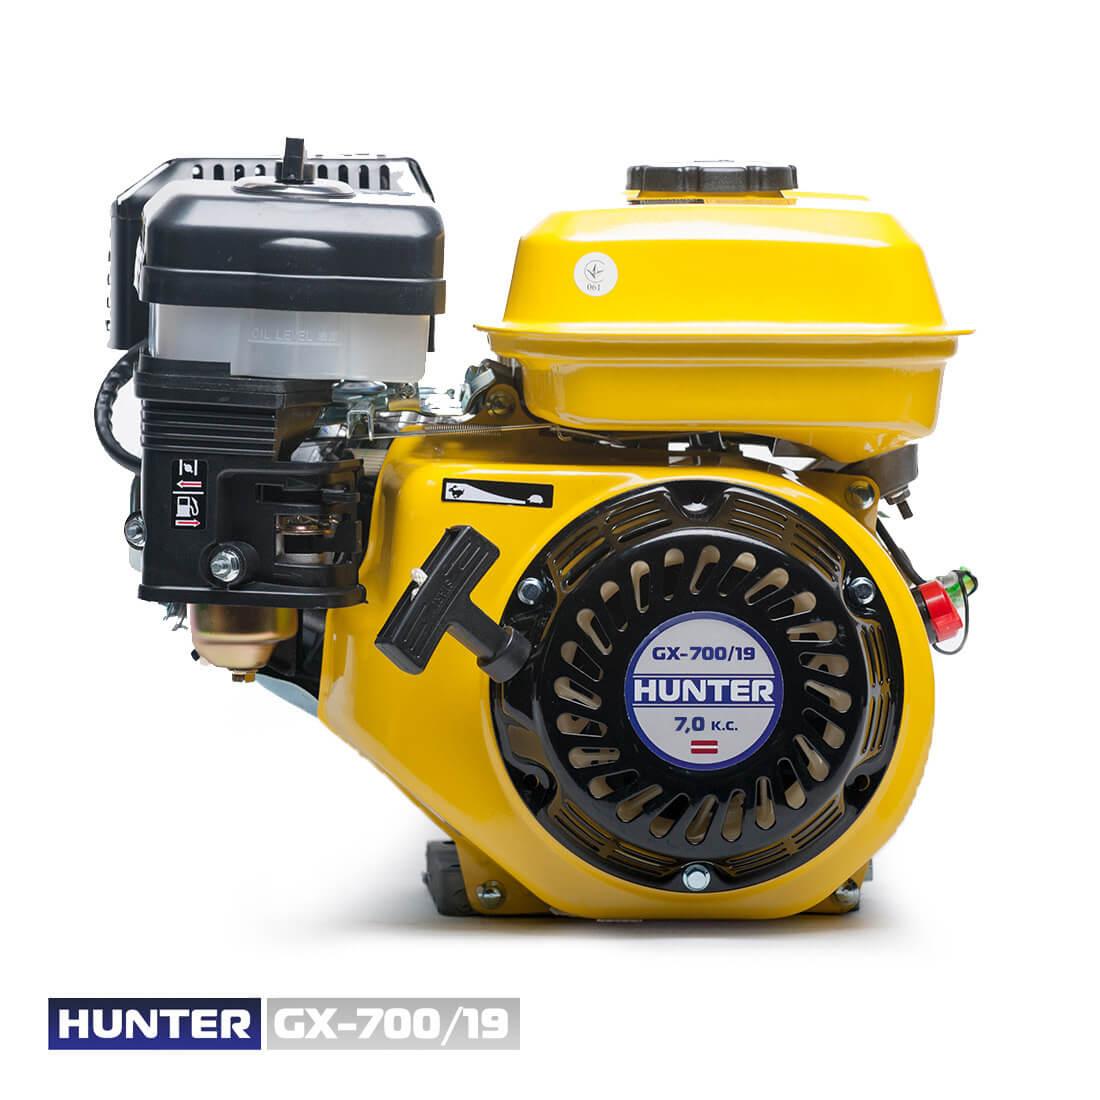 Фото GX-700/19 (шпонка) цена 3500грн №2 — Hunter